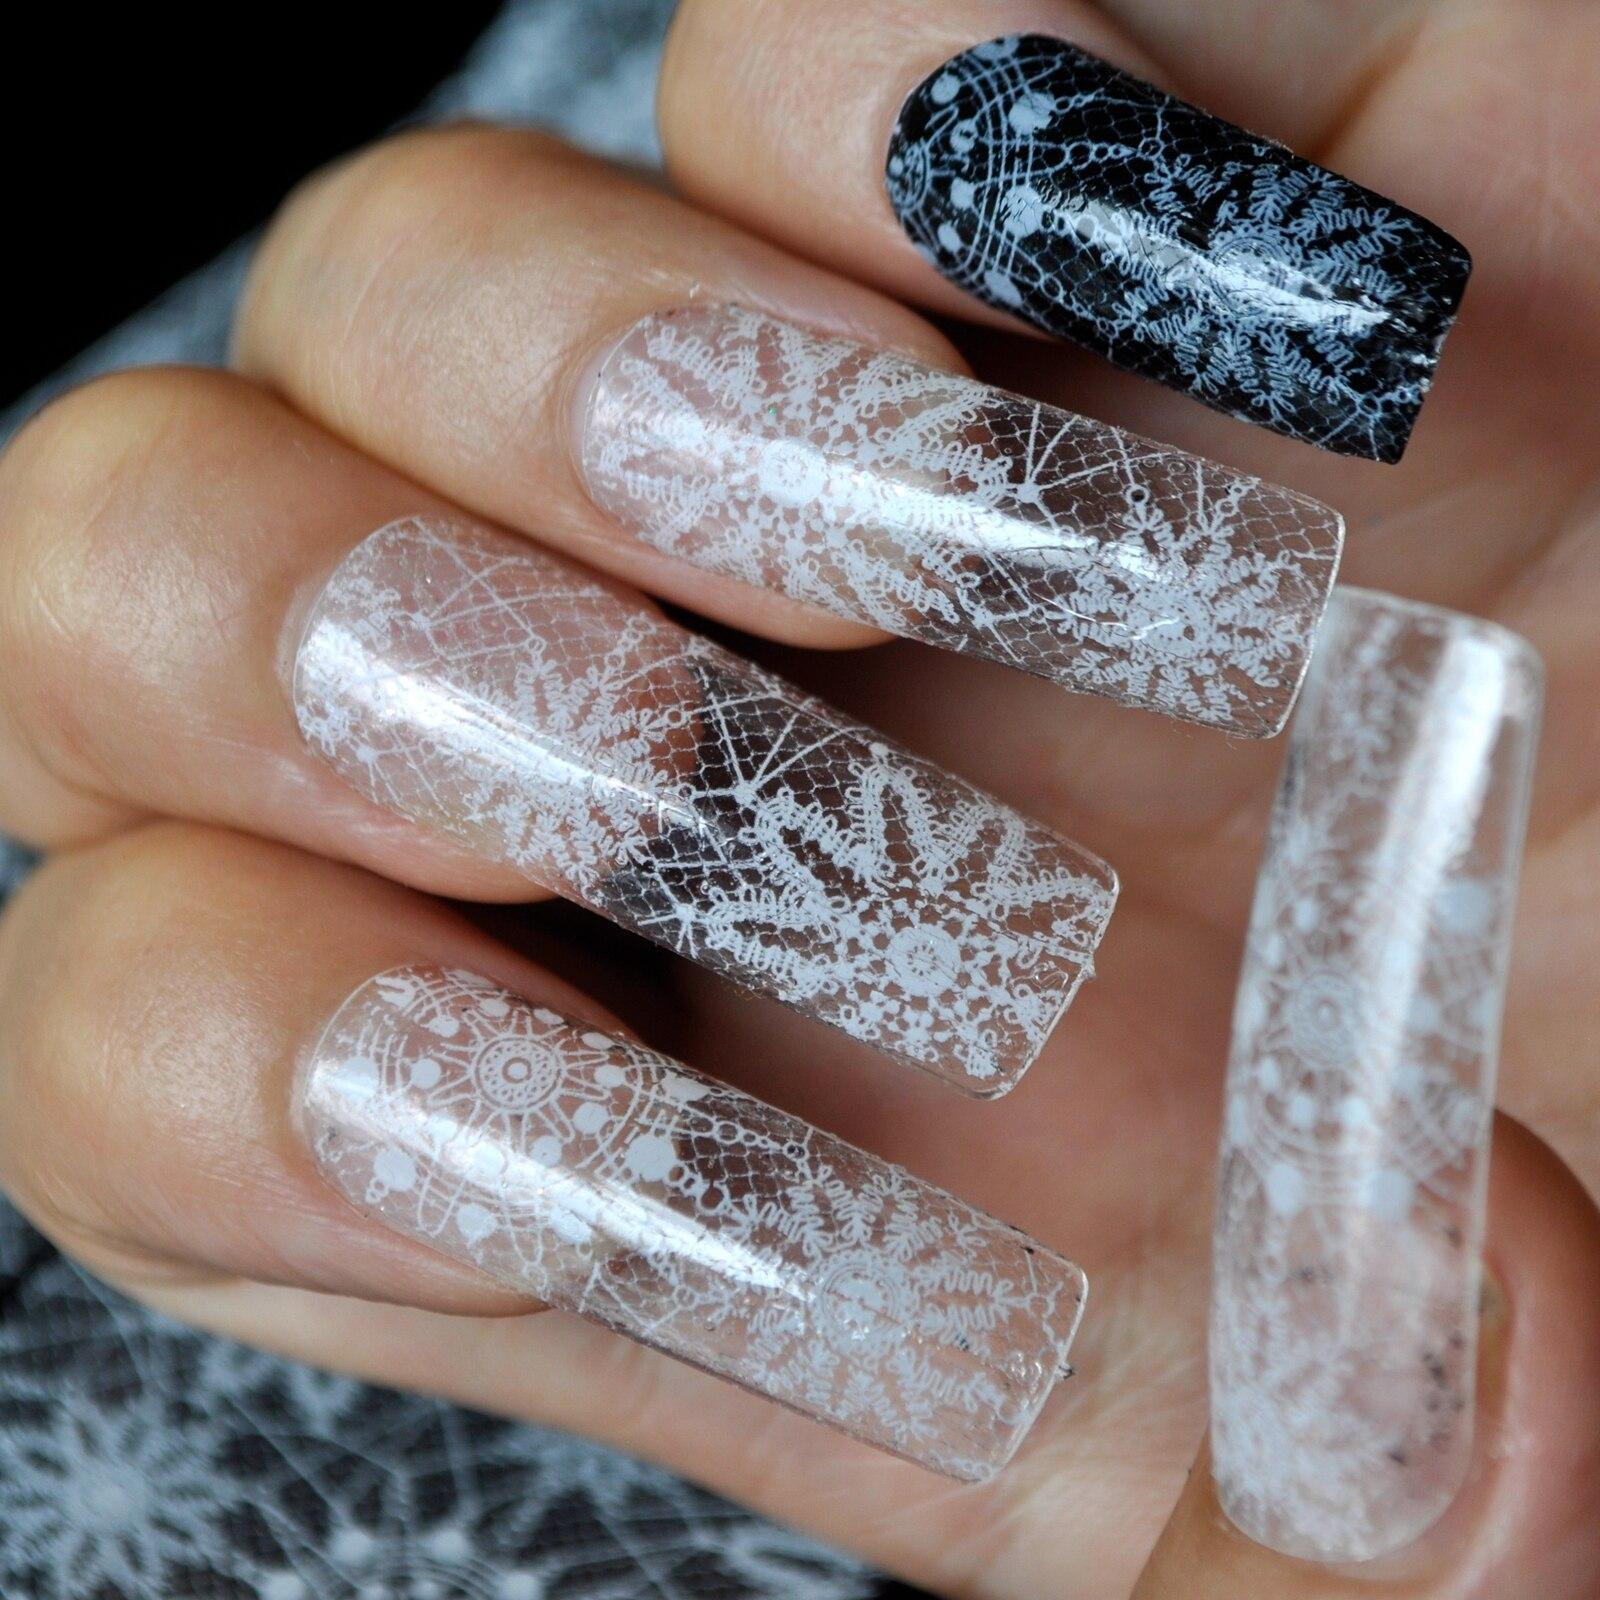 Nail art Transferfolie Nagel abziehbilder Tipps Maniküre DIY ...